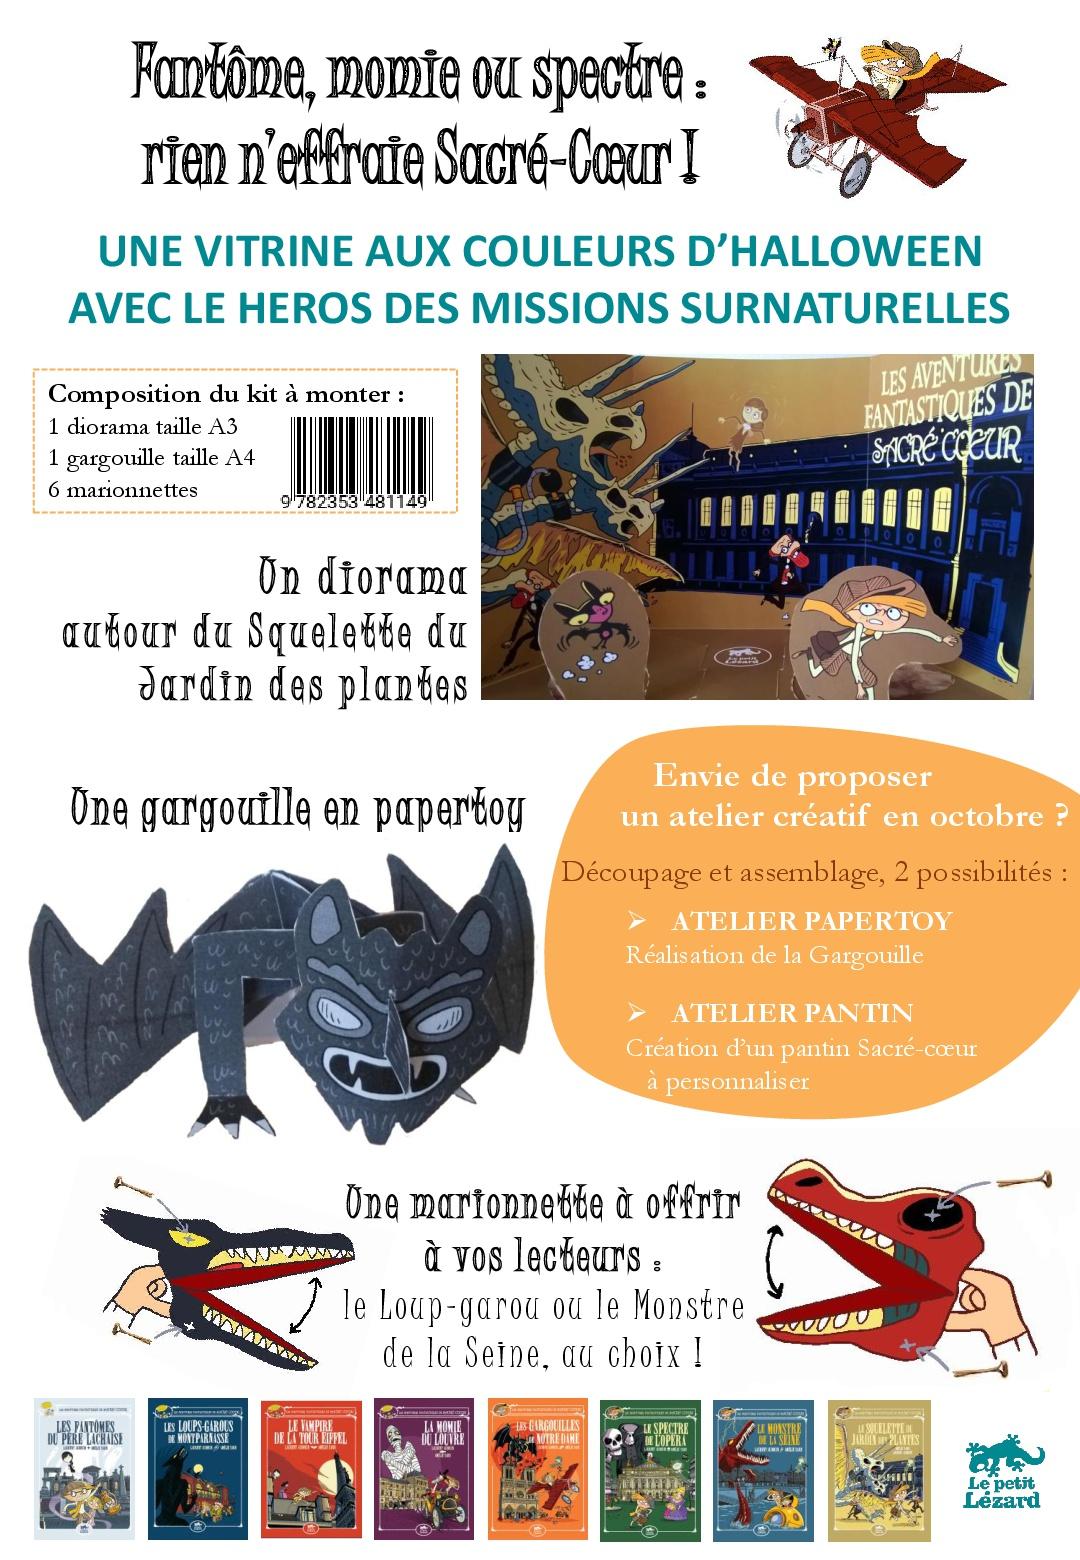 Un kit vitrine spécial Hallowwen avec gargouille, loup-garou et monstre...